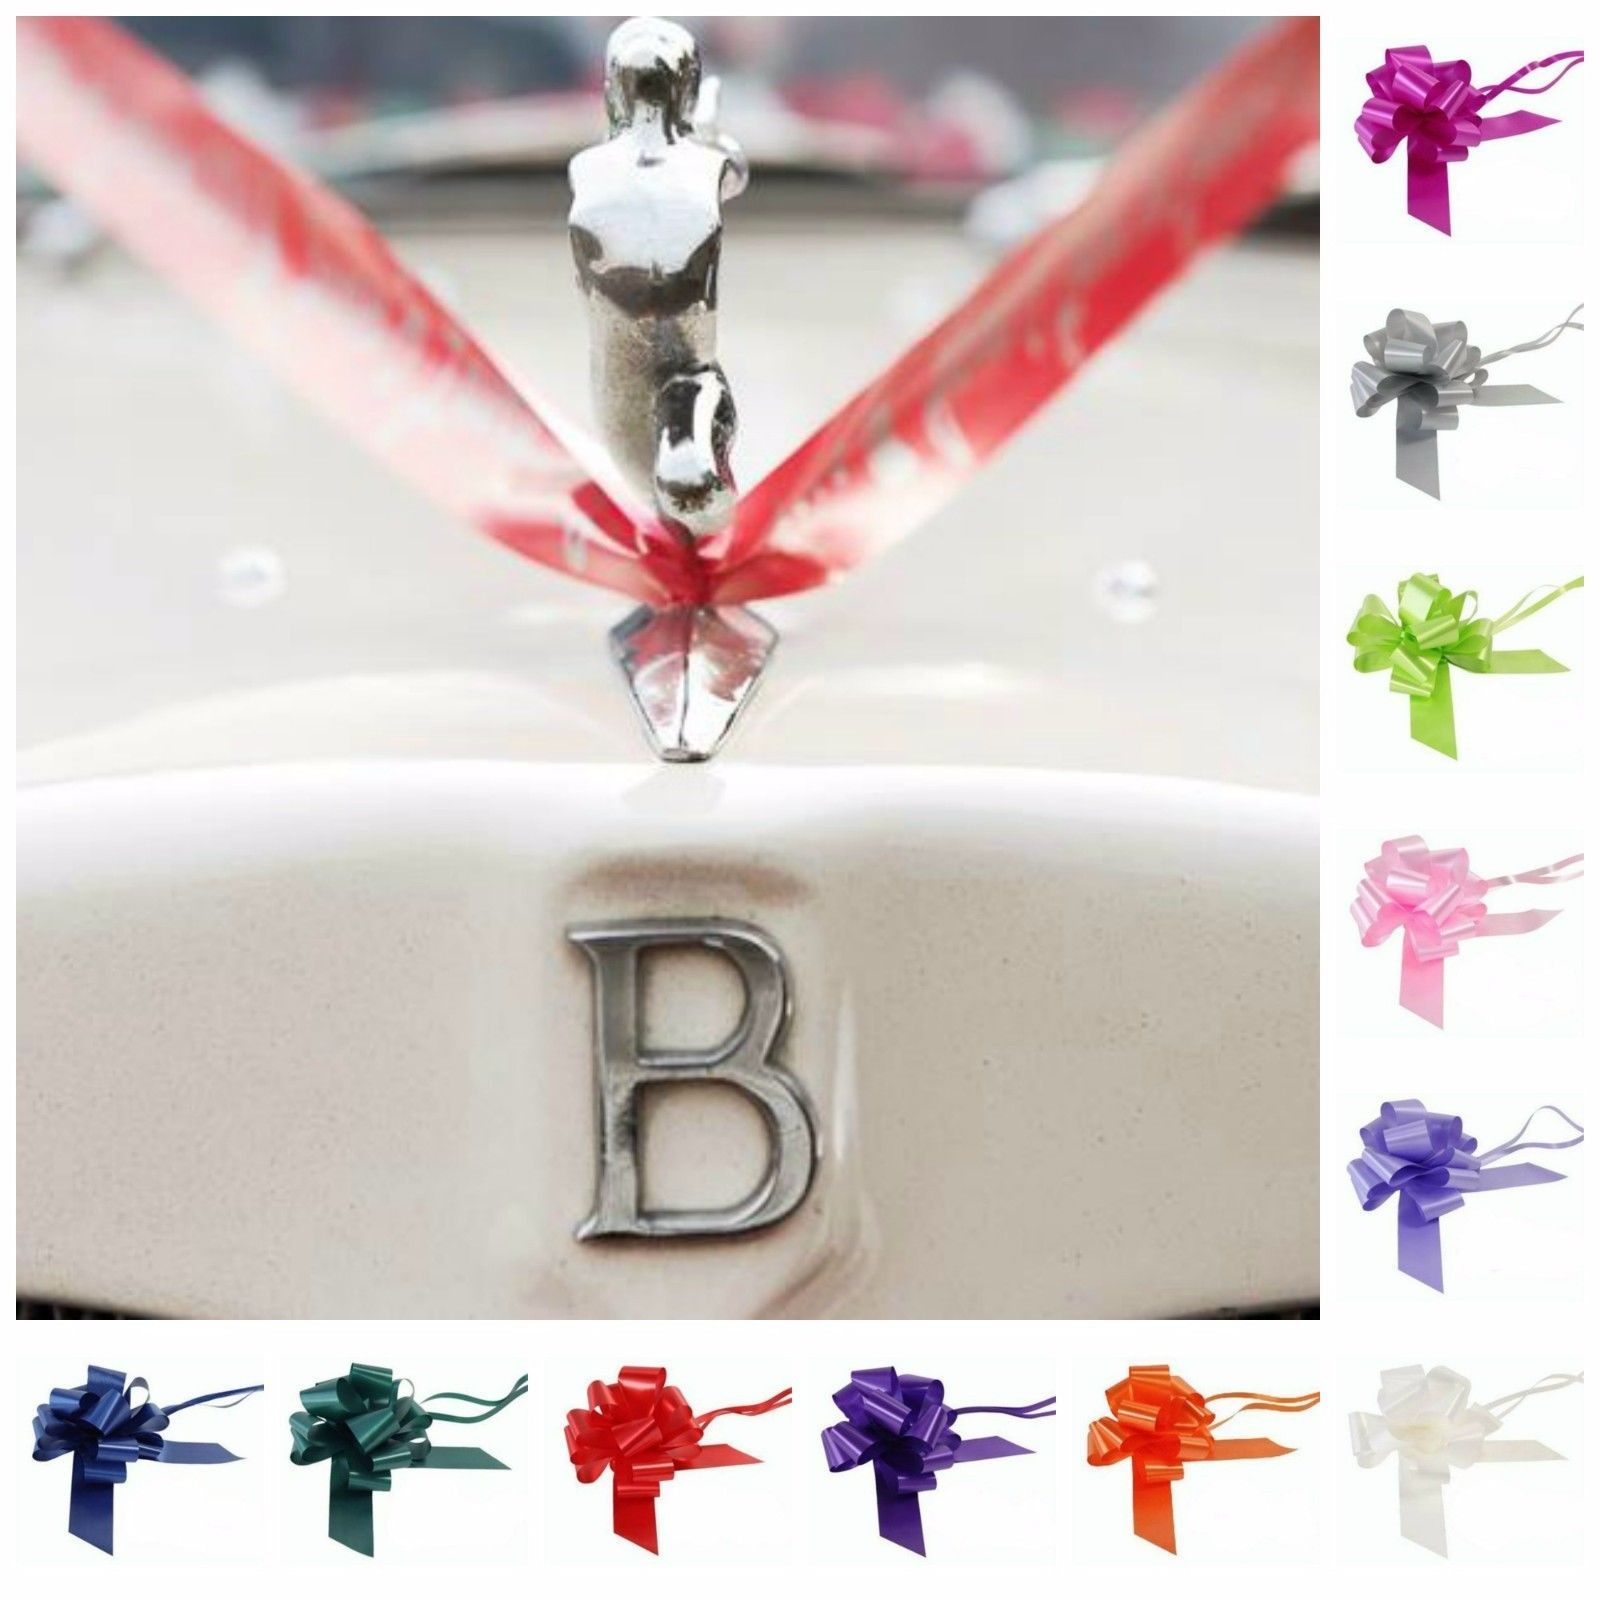 Wedding car decoration ideas  Wedding Car Decoration Kit  Metreus Ribbon  Or  Large Mm Bows